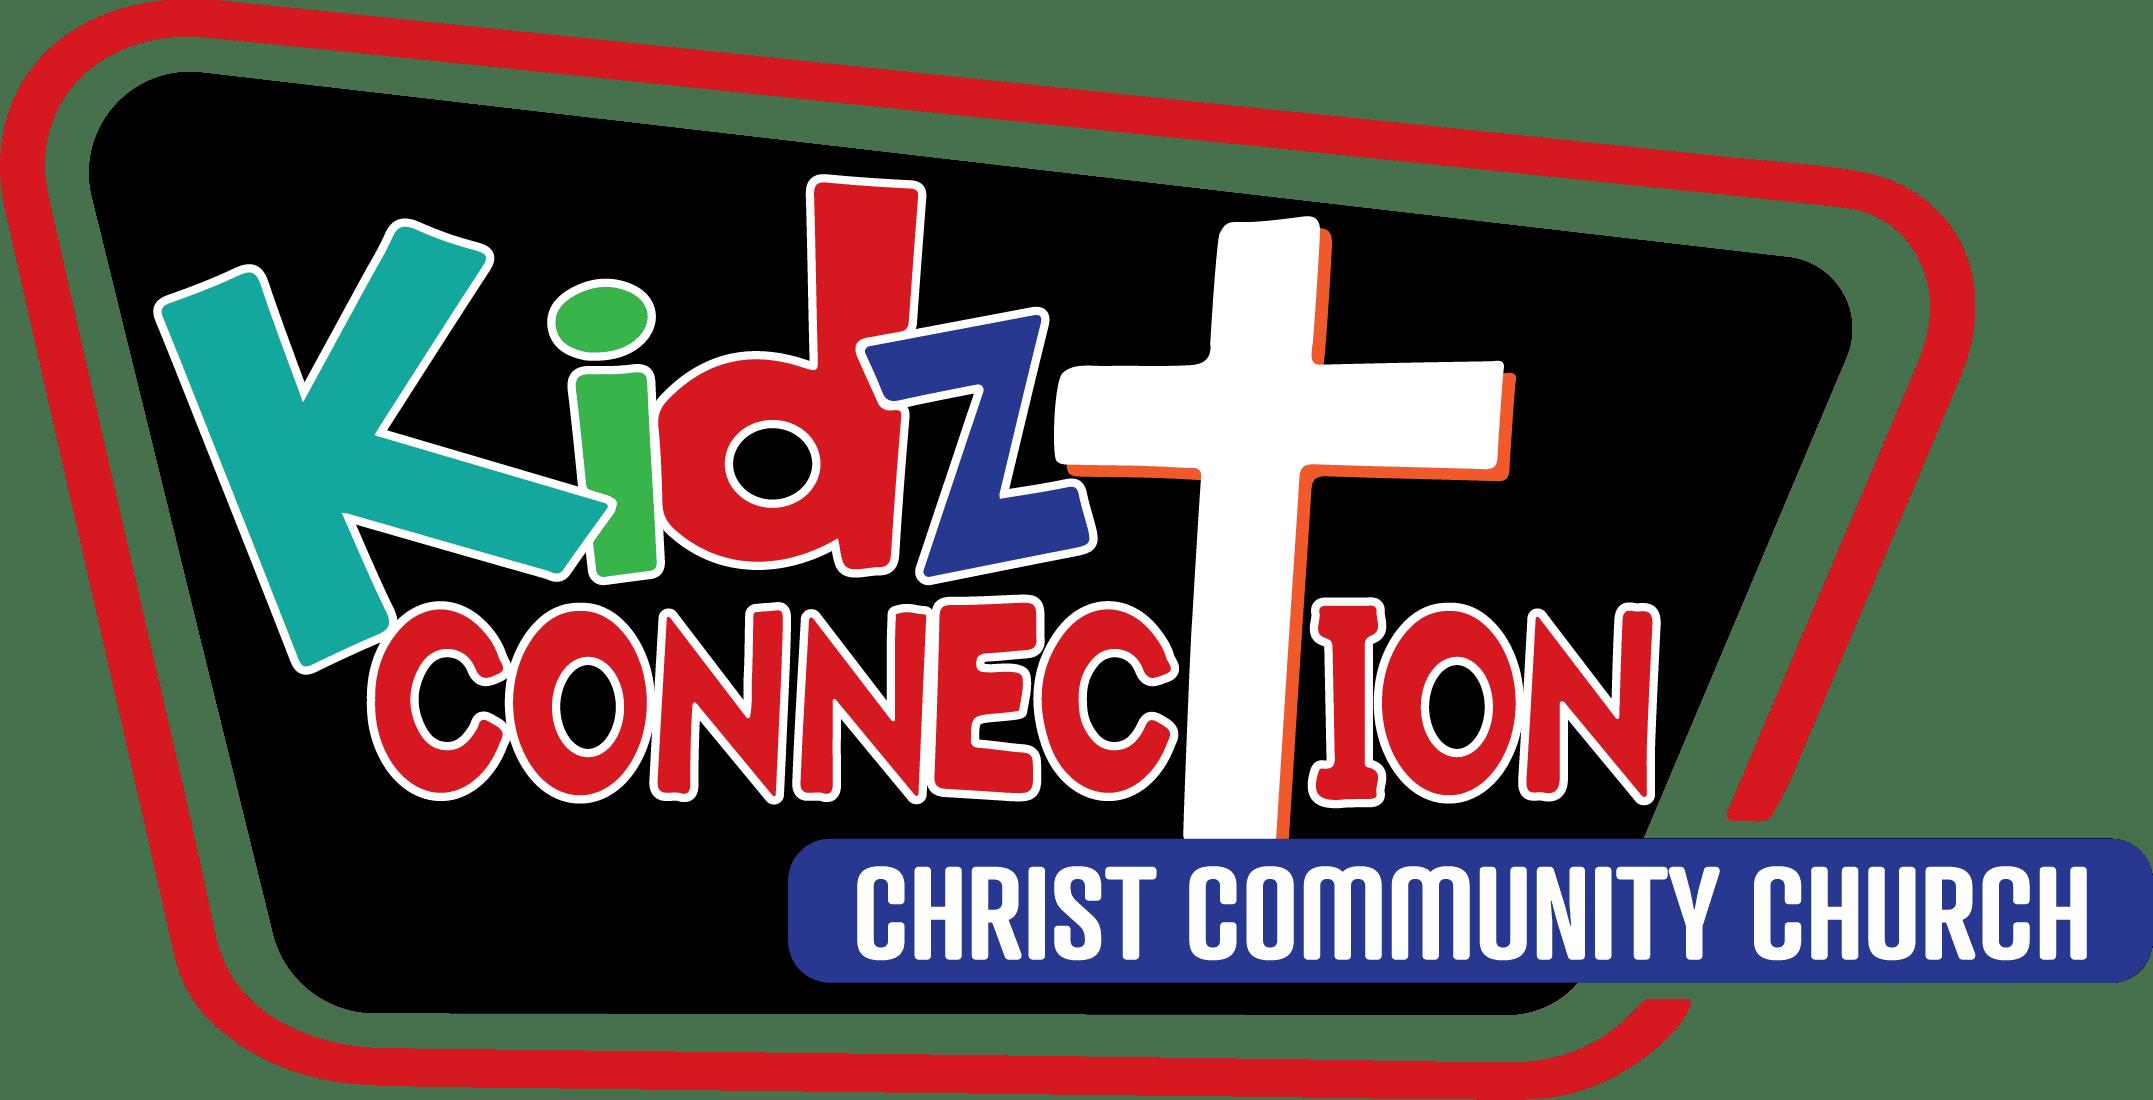 Kidz Connection Children's Ministry - Christ Community Church The Pentecostals - Henderson, TN